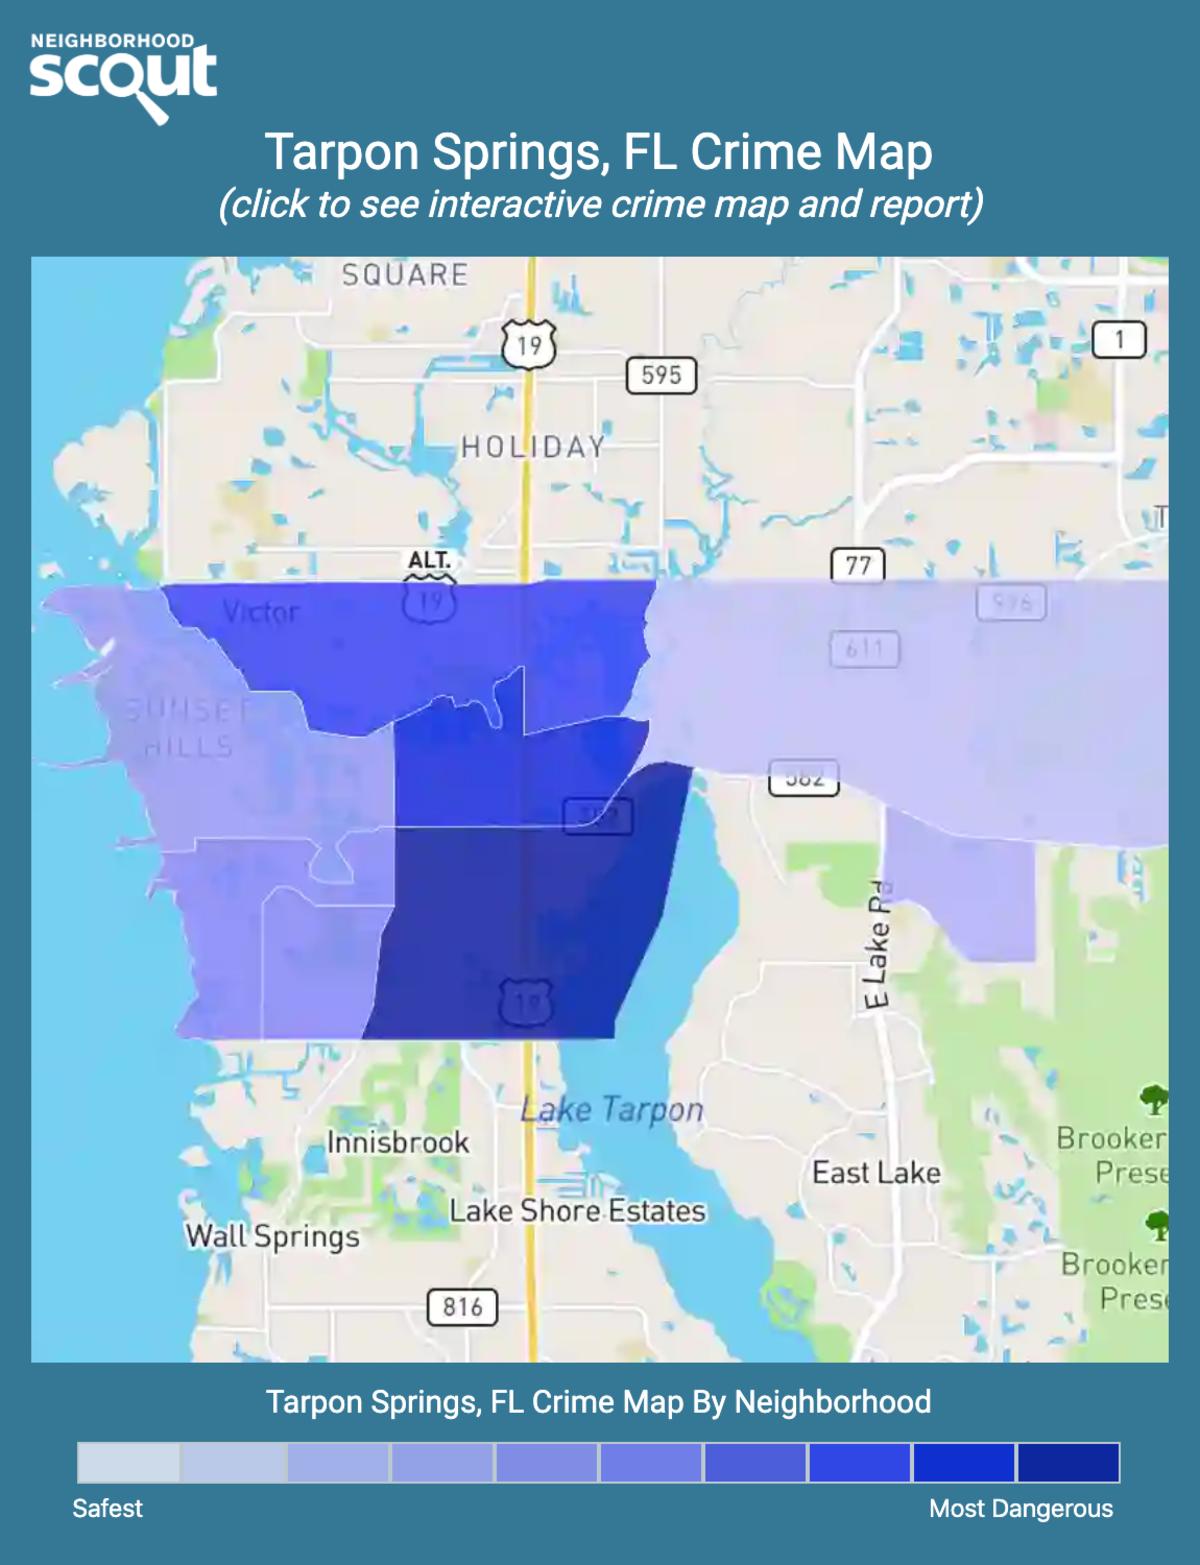 Tarpon Springs, Florida crime map